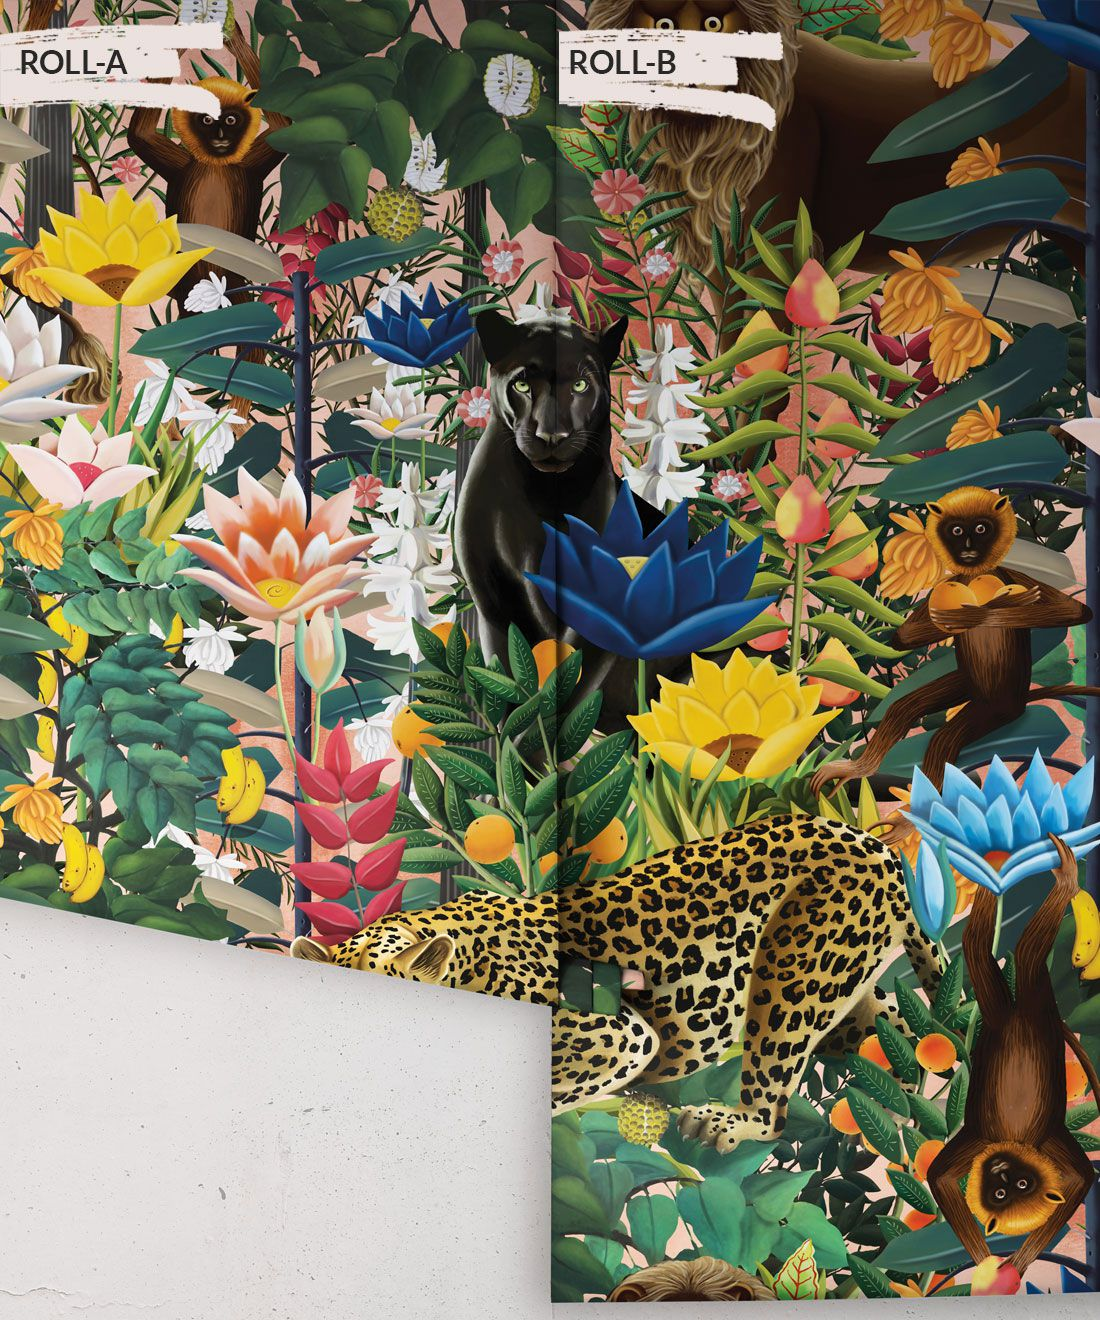 The Jungle Wallpaper • Animal Wallpaper • Botanical Wallpaper • Coral Wallpaper • Rolls